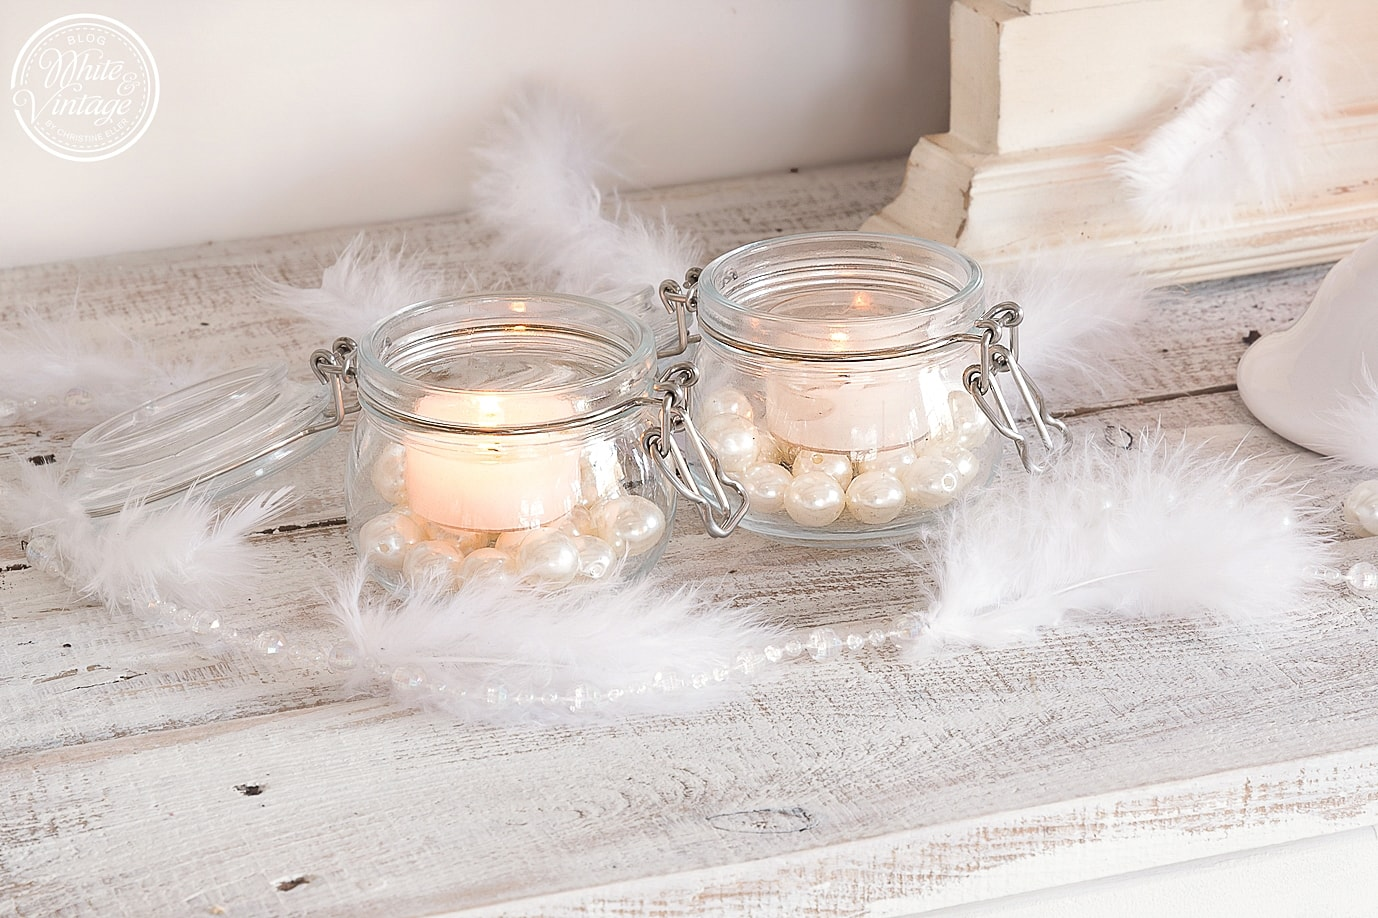 deko selber machen stilvolle kerzenhalter aus draht white and vintage. Black Bedroom Furniture Sets. Home Design Ideas